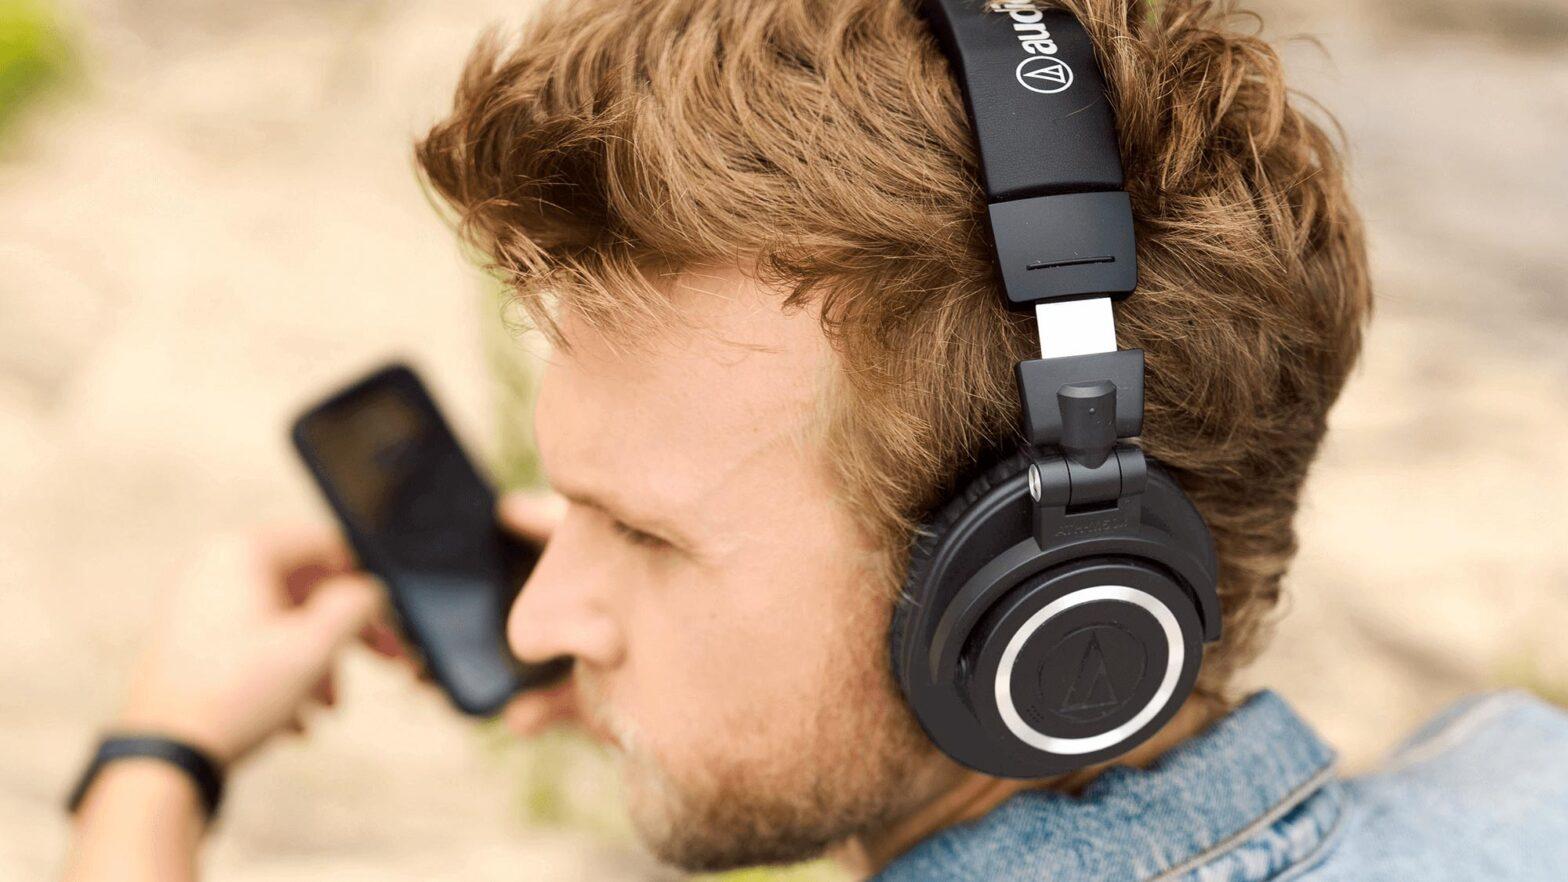 Audio-Technica ATH-M50xBT2 Headphones